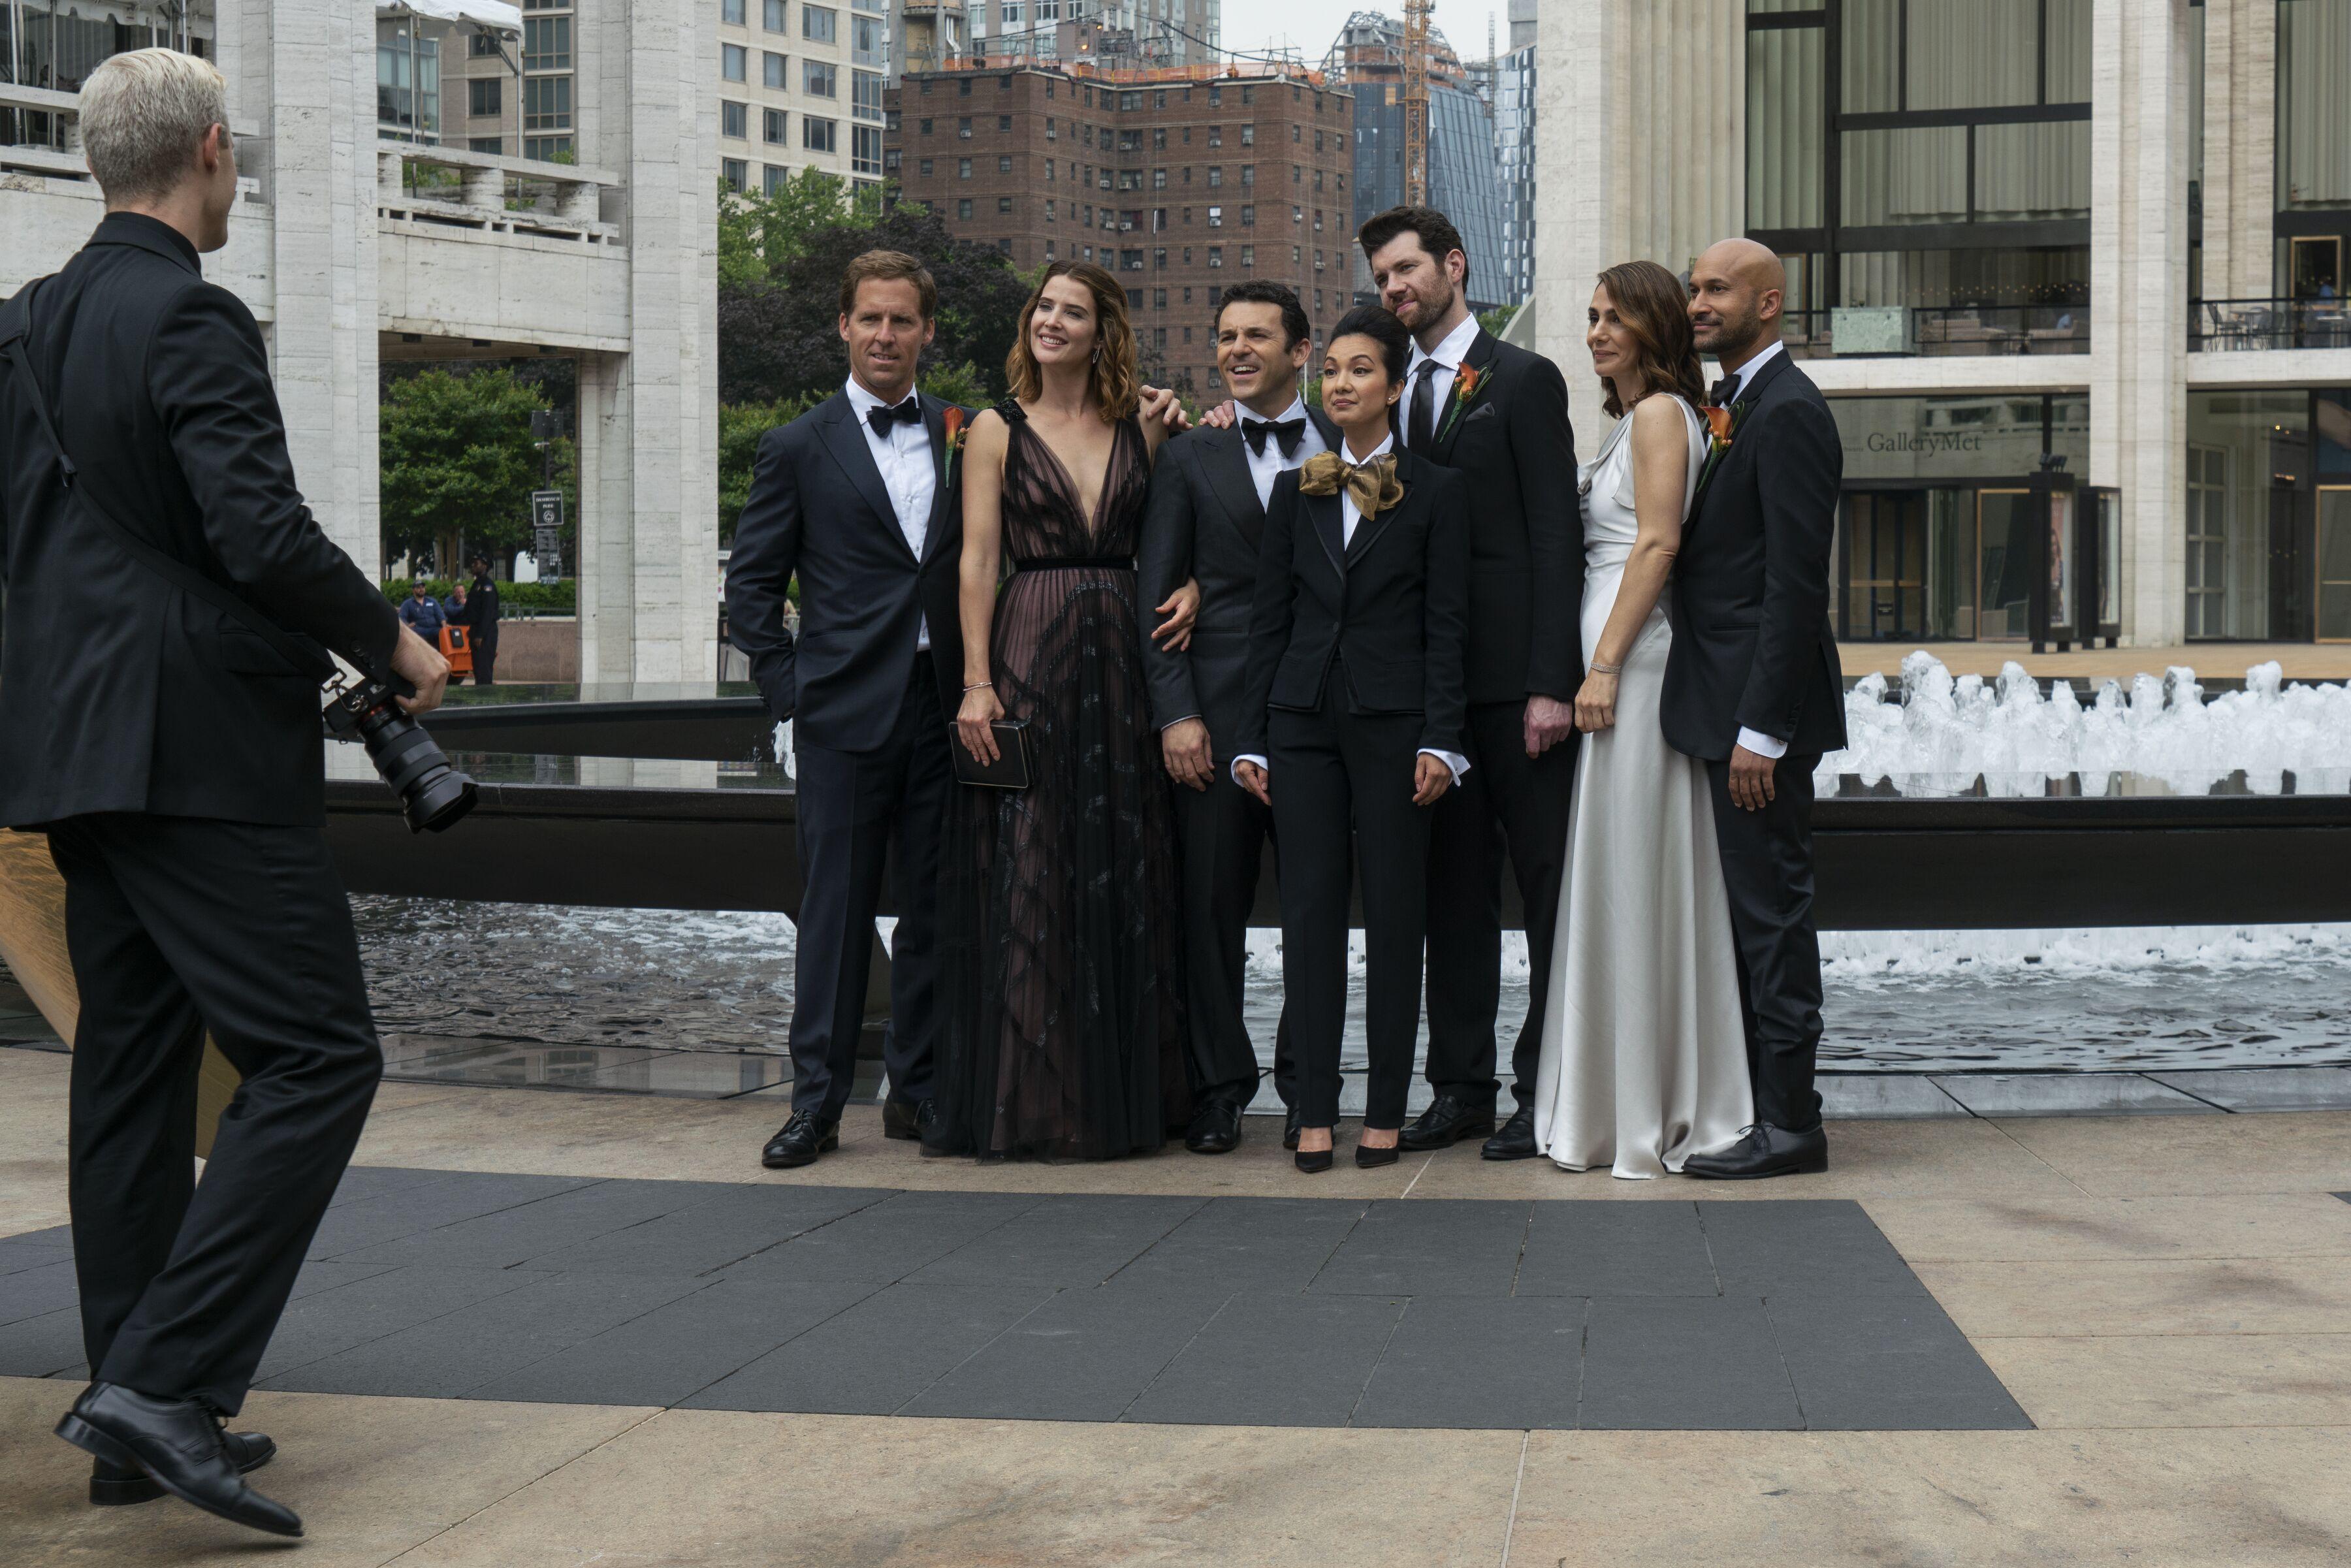 Friends from College season 2 finale recap: The Wedding